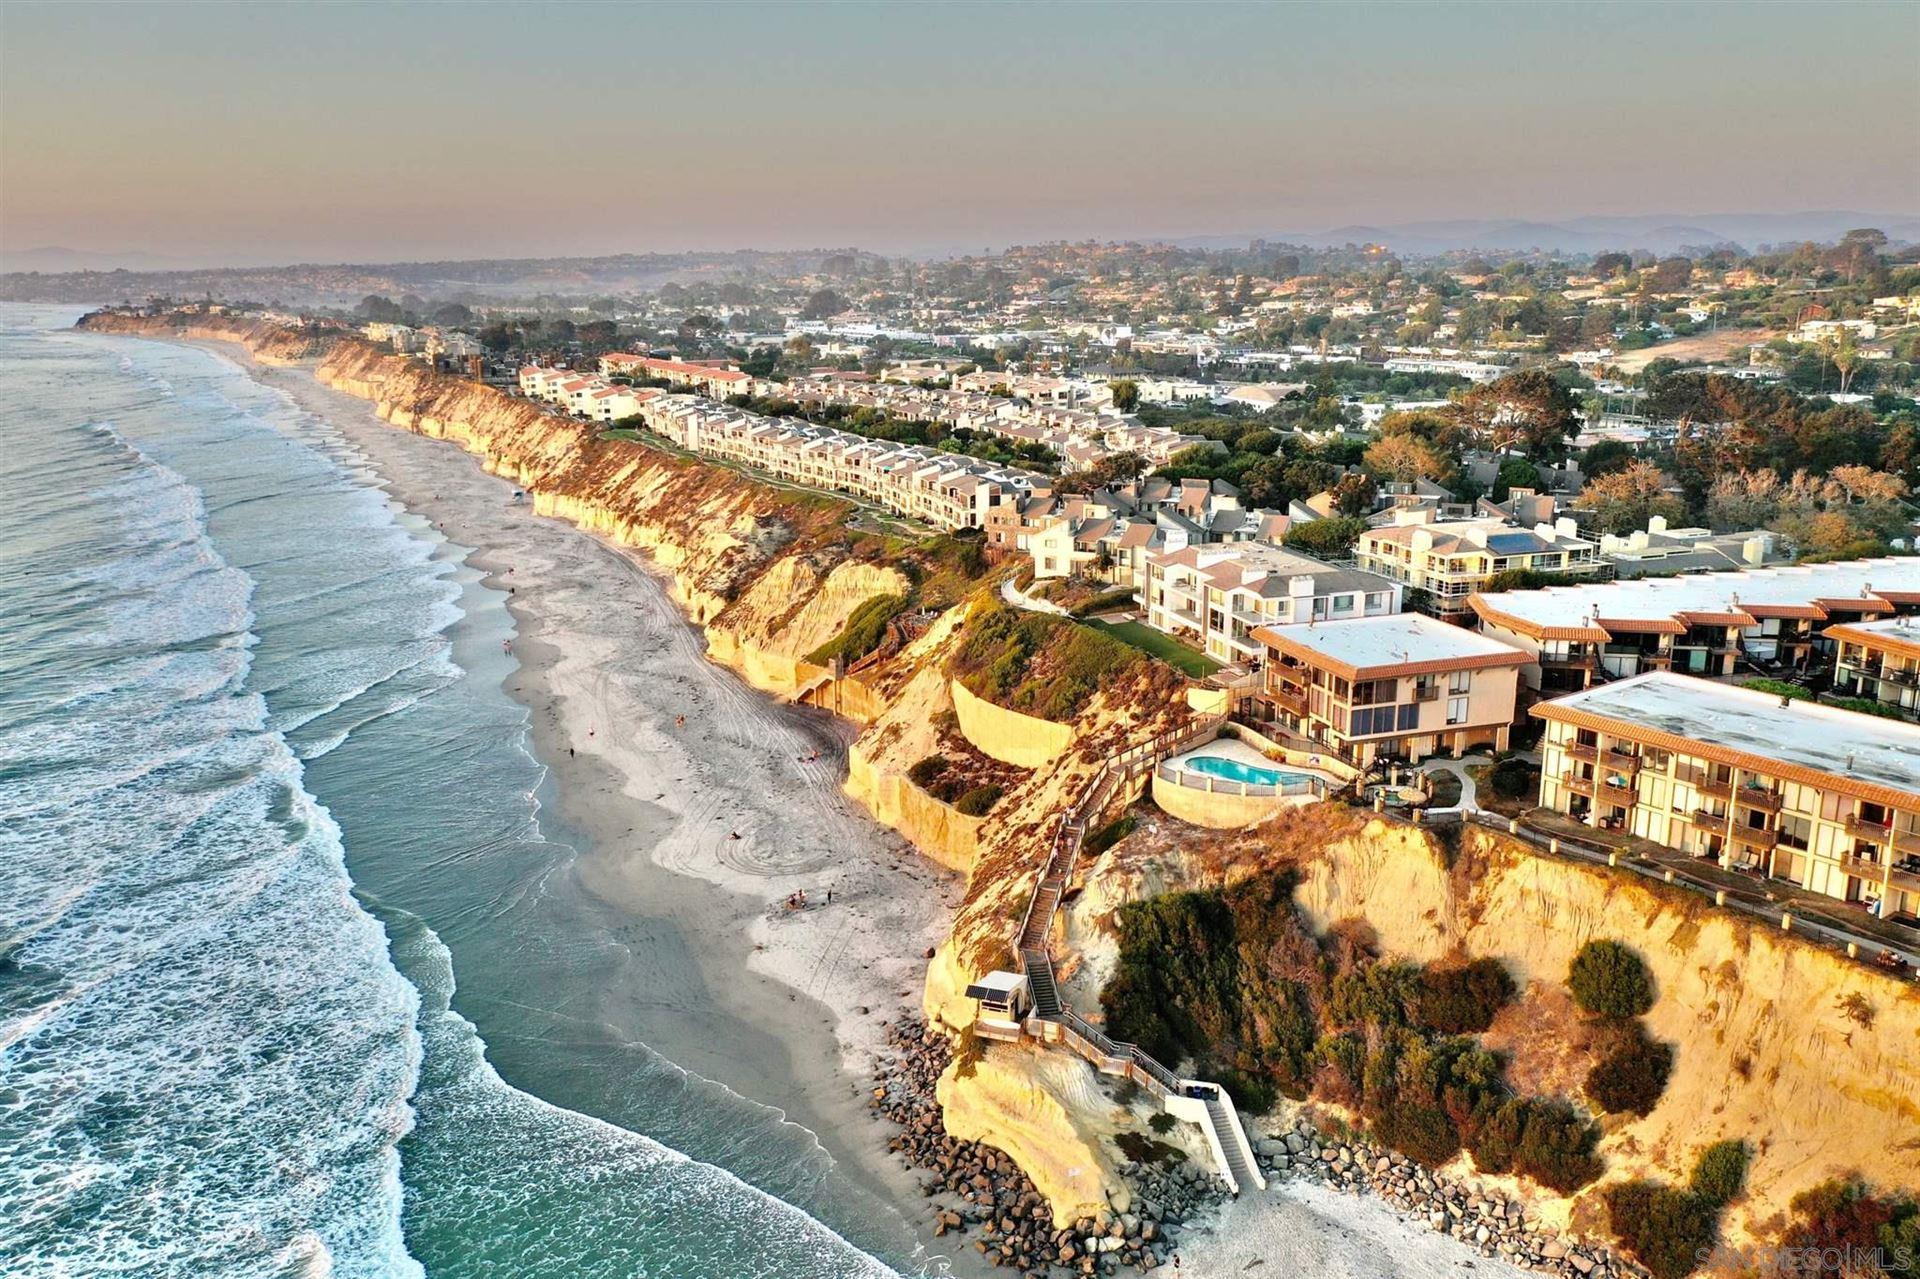 Photo for 707 S S Sierra Ave #19, Solana Beach, CA 92075 (MLS # 210002883)